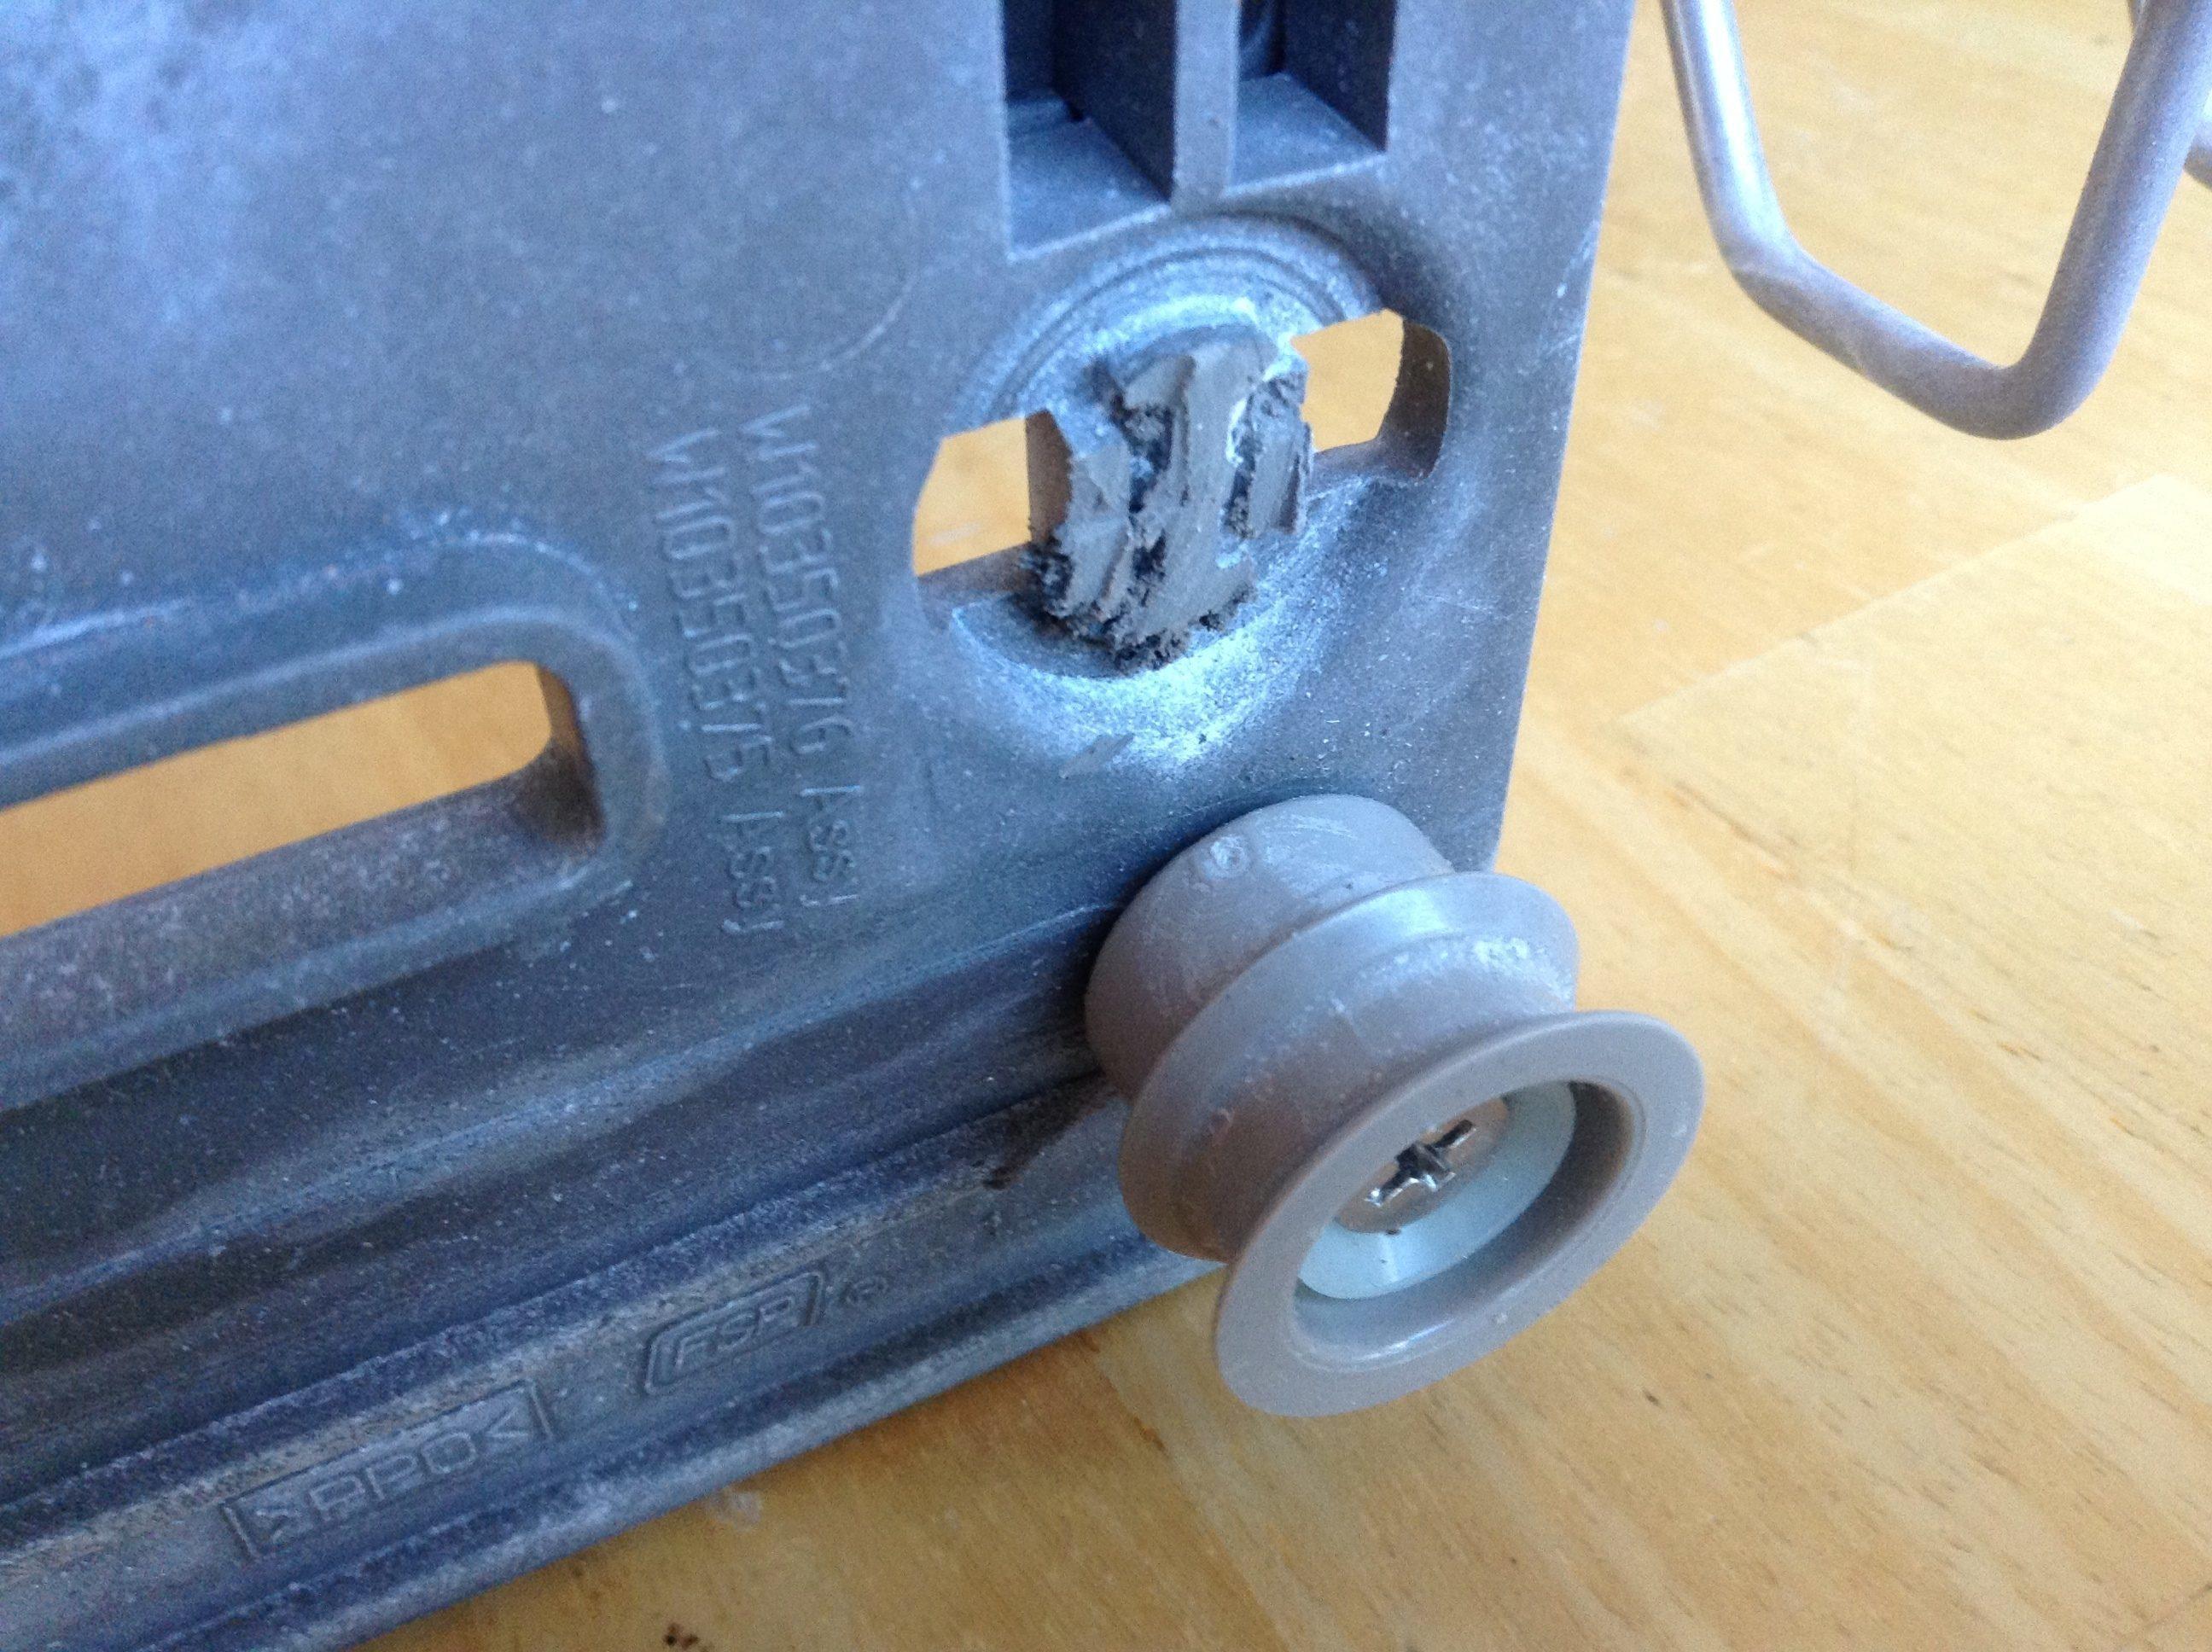 How To Repair Dishwasher 100 Ideas Kitchenaid Dishwasher Model Kudc10fxss Manual On Www